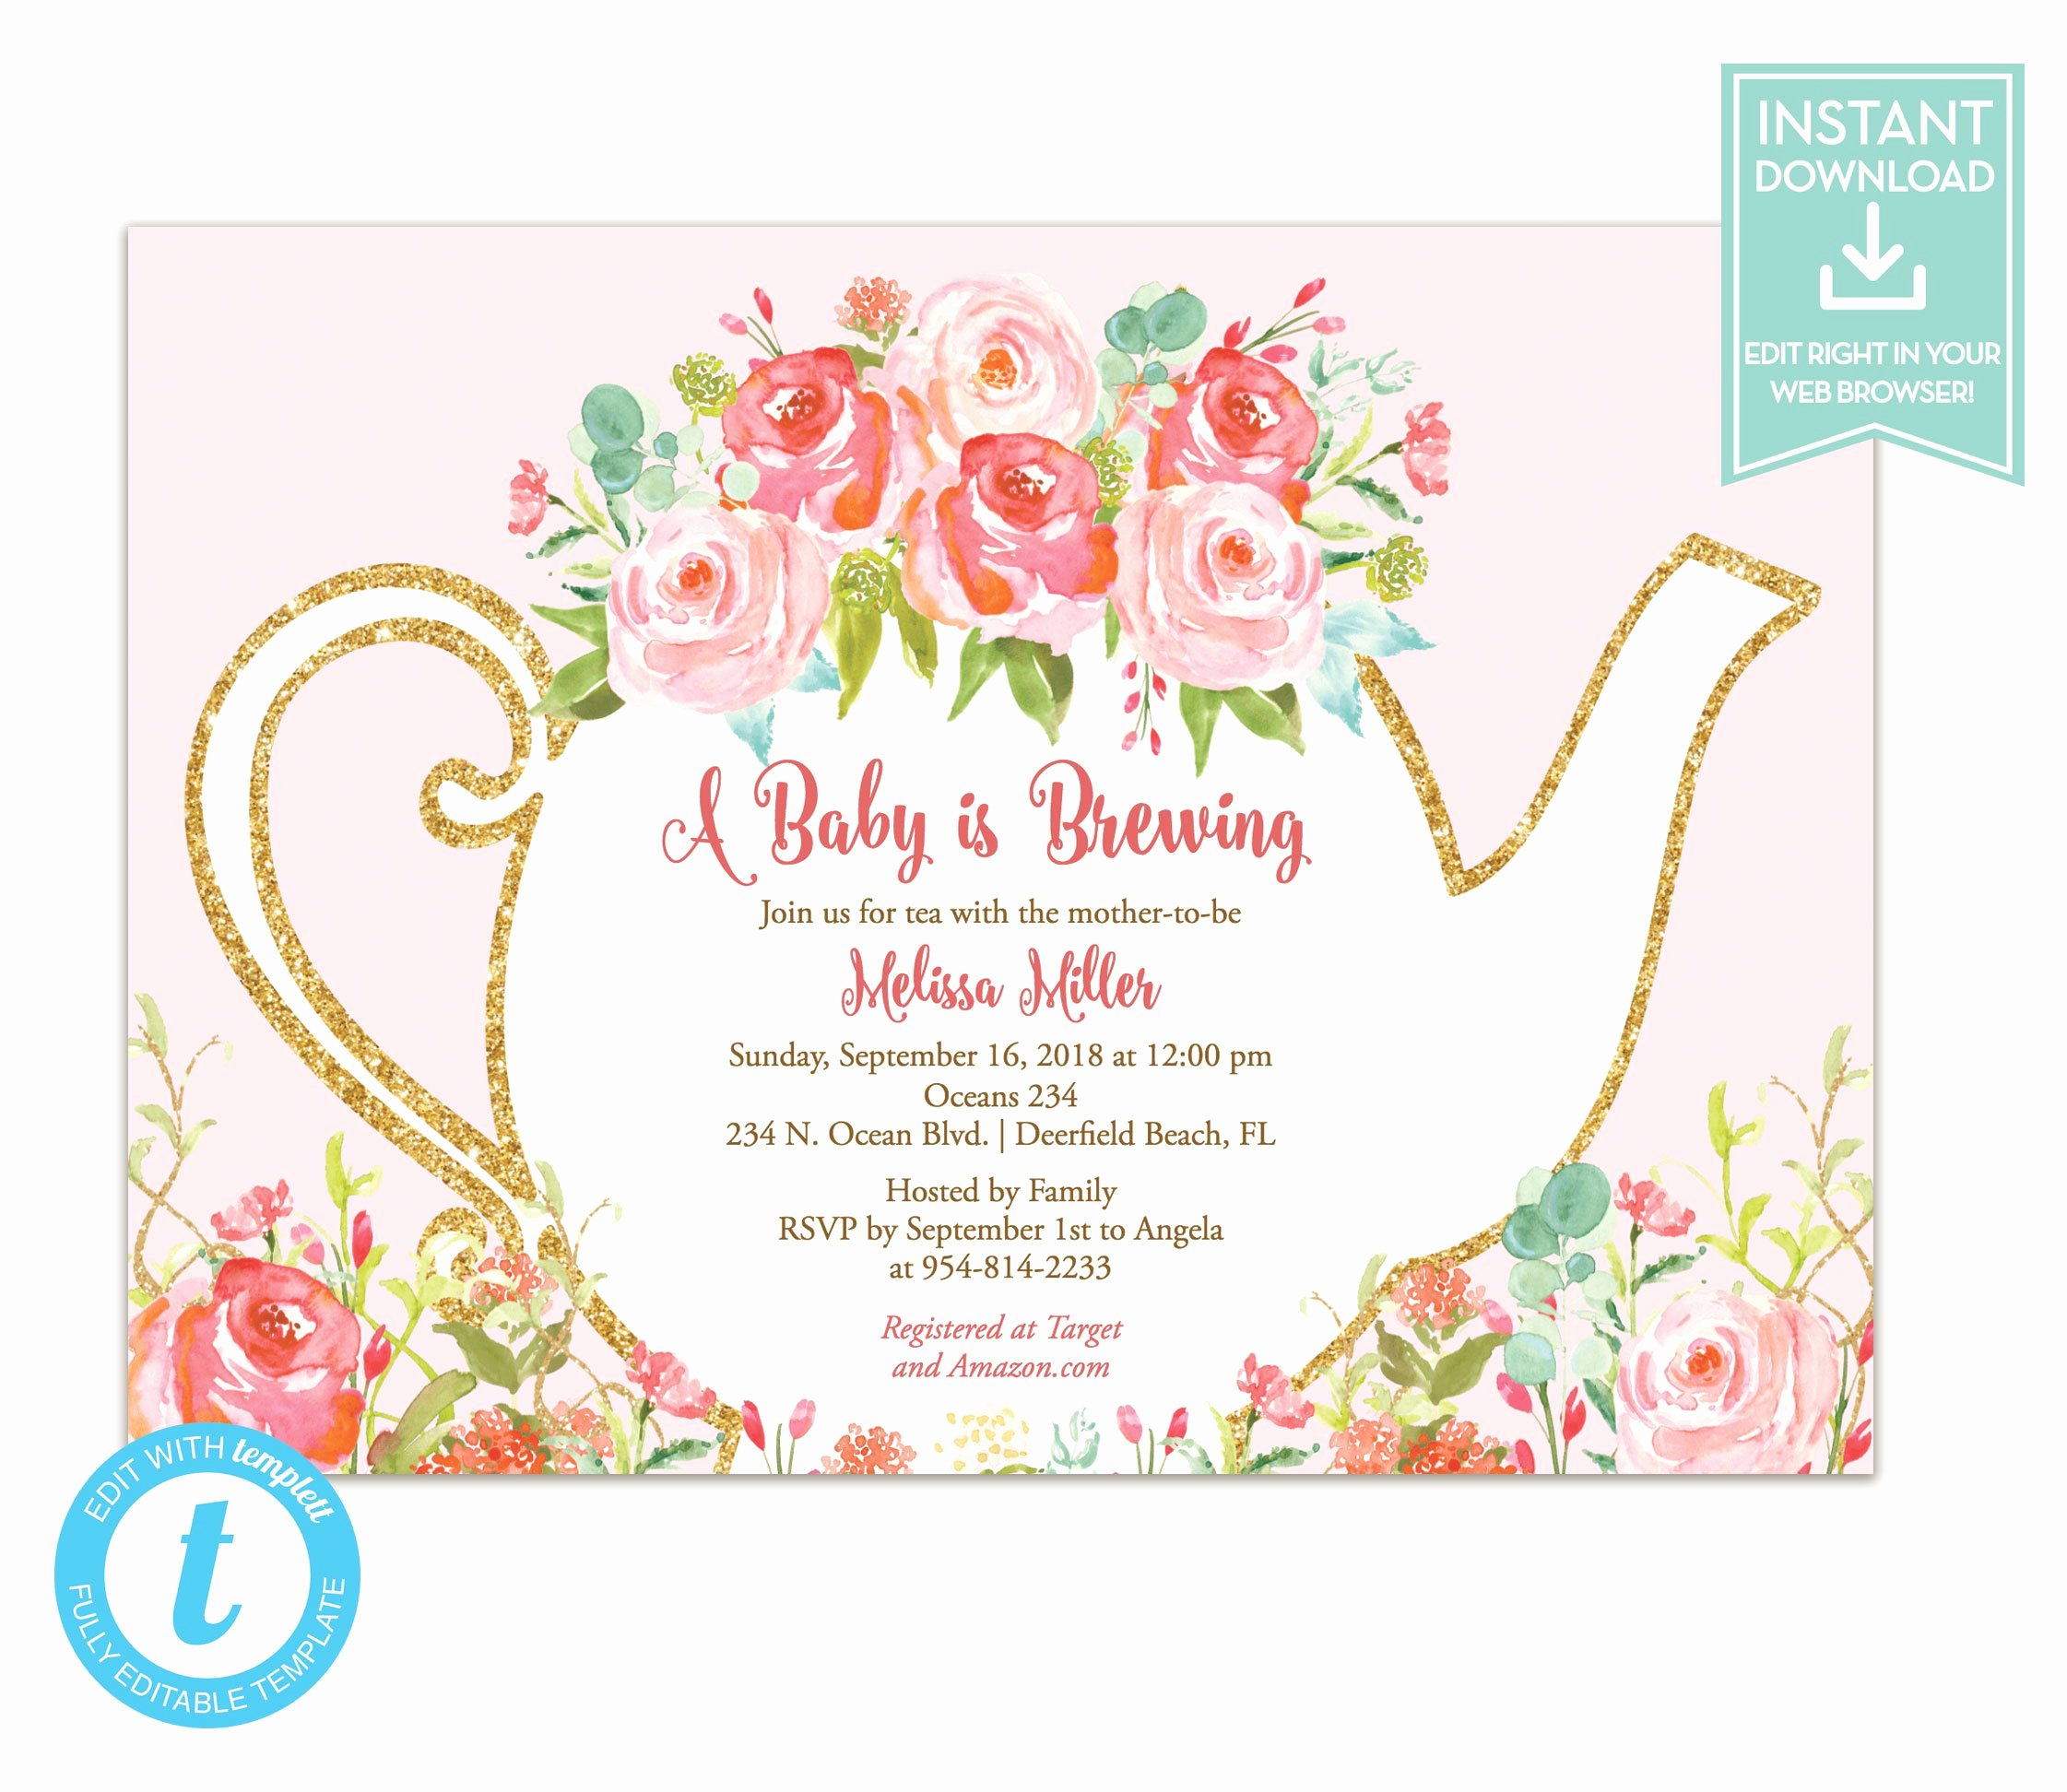 Tea Party Invite Template Elegant Tea Party Invitation Template Floral Teapot Bridal Shower